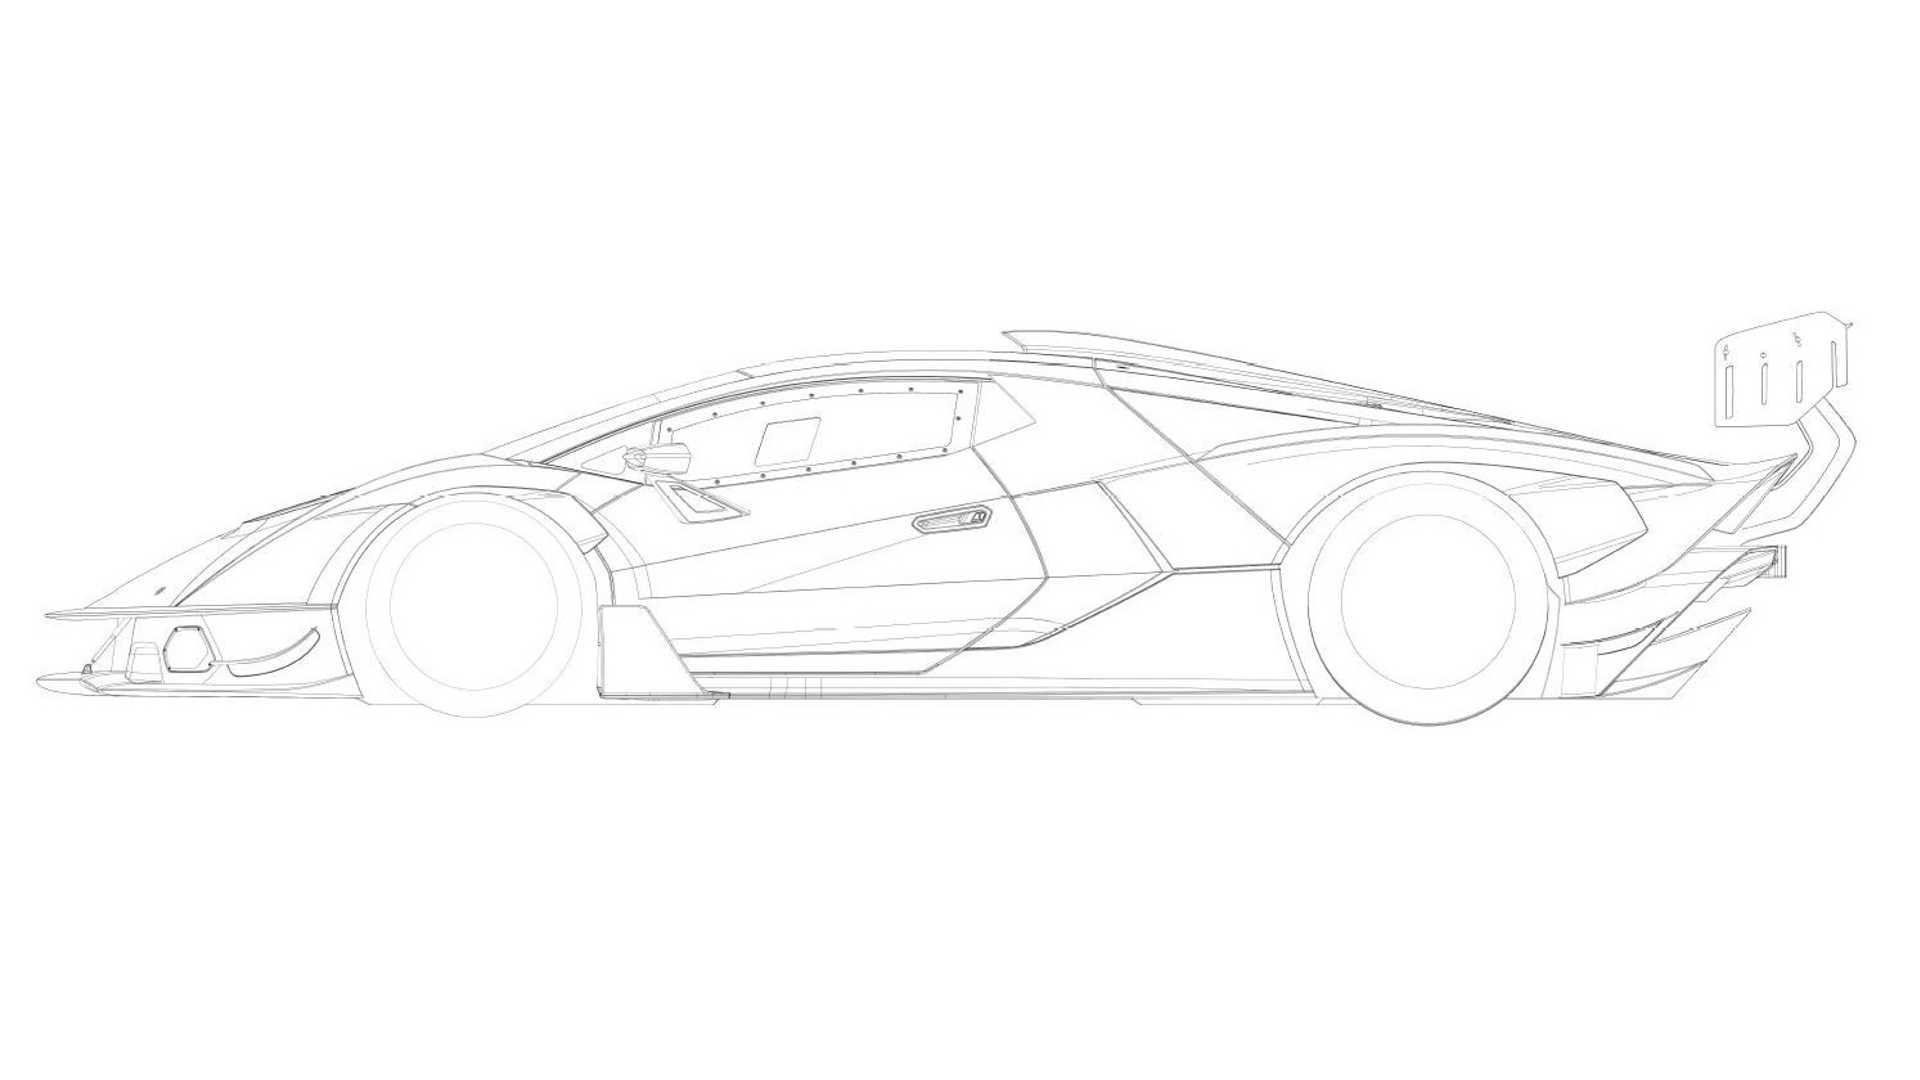 Tohle Je Lamborghini Scv12 Zatim Na Patentov Ch Snimcich